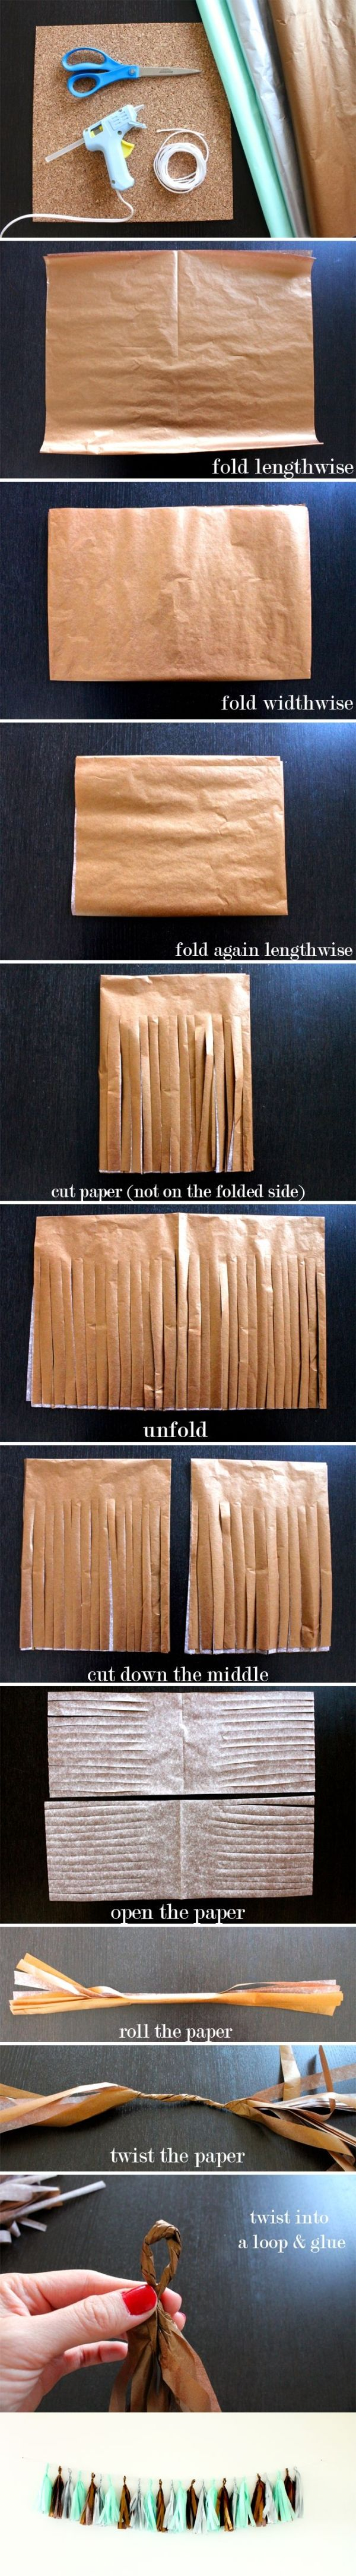 DIY : How to make a Tissue Paper Tassel Garland by victoriamajor88